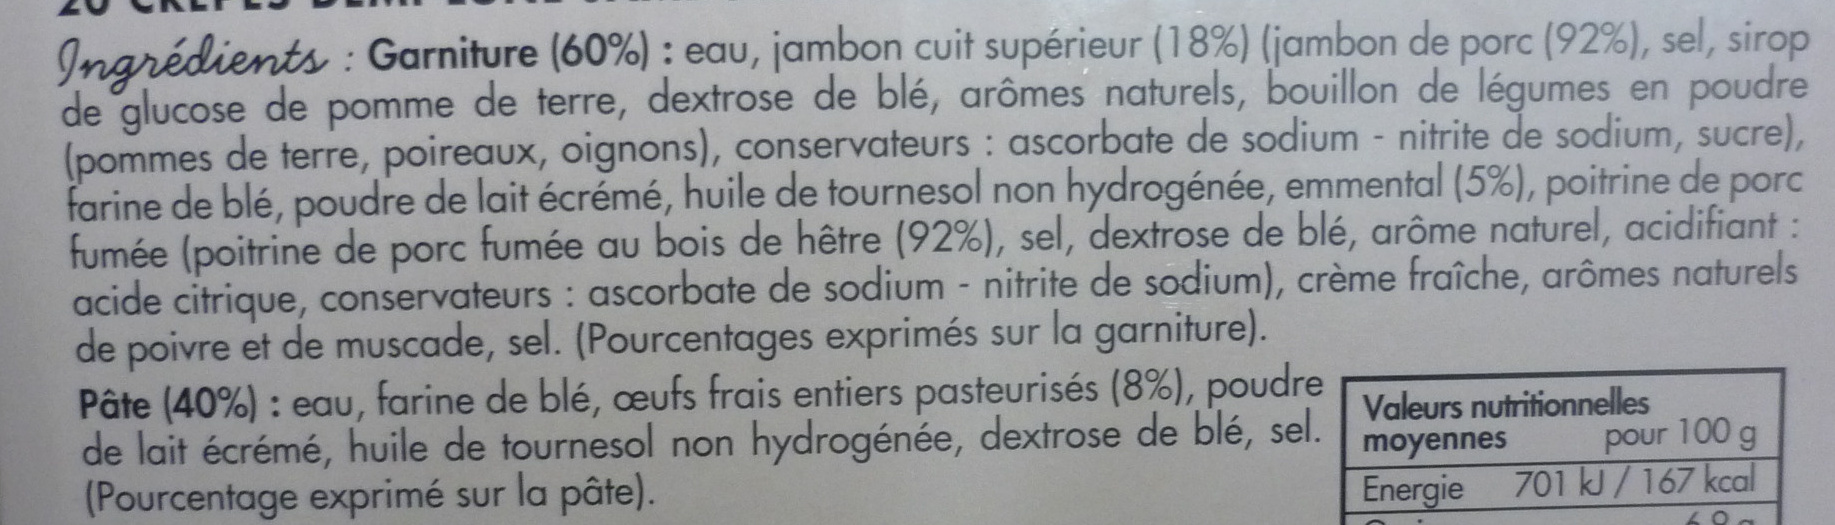 20 crêpes demi-lune jambon emmental - Ingrediënten - fr